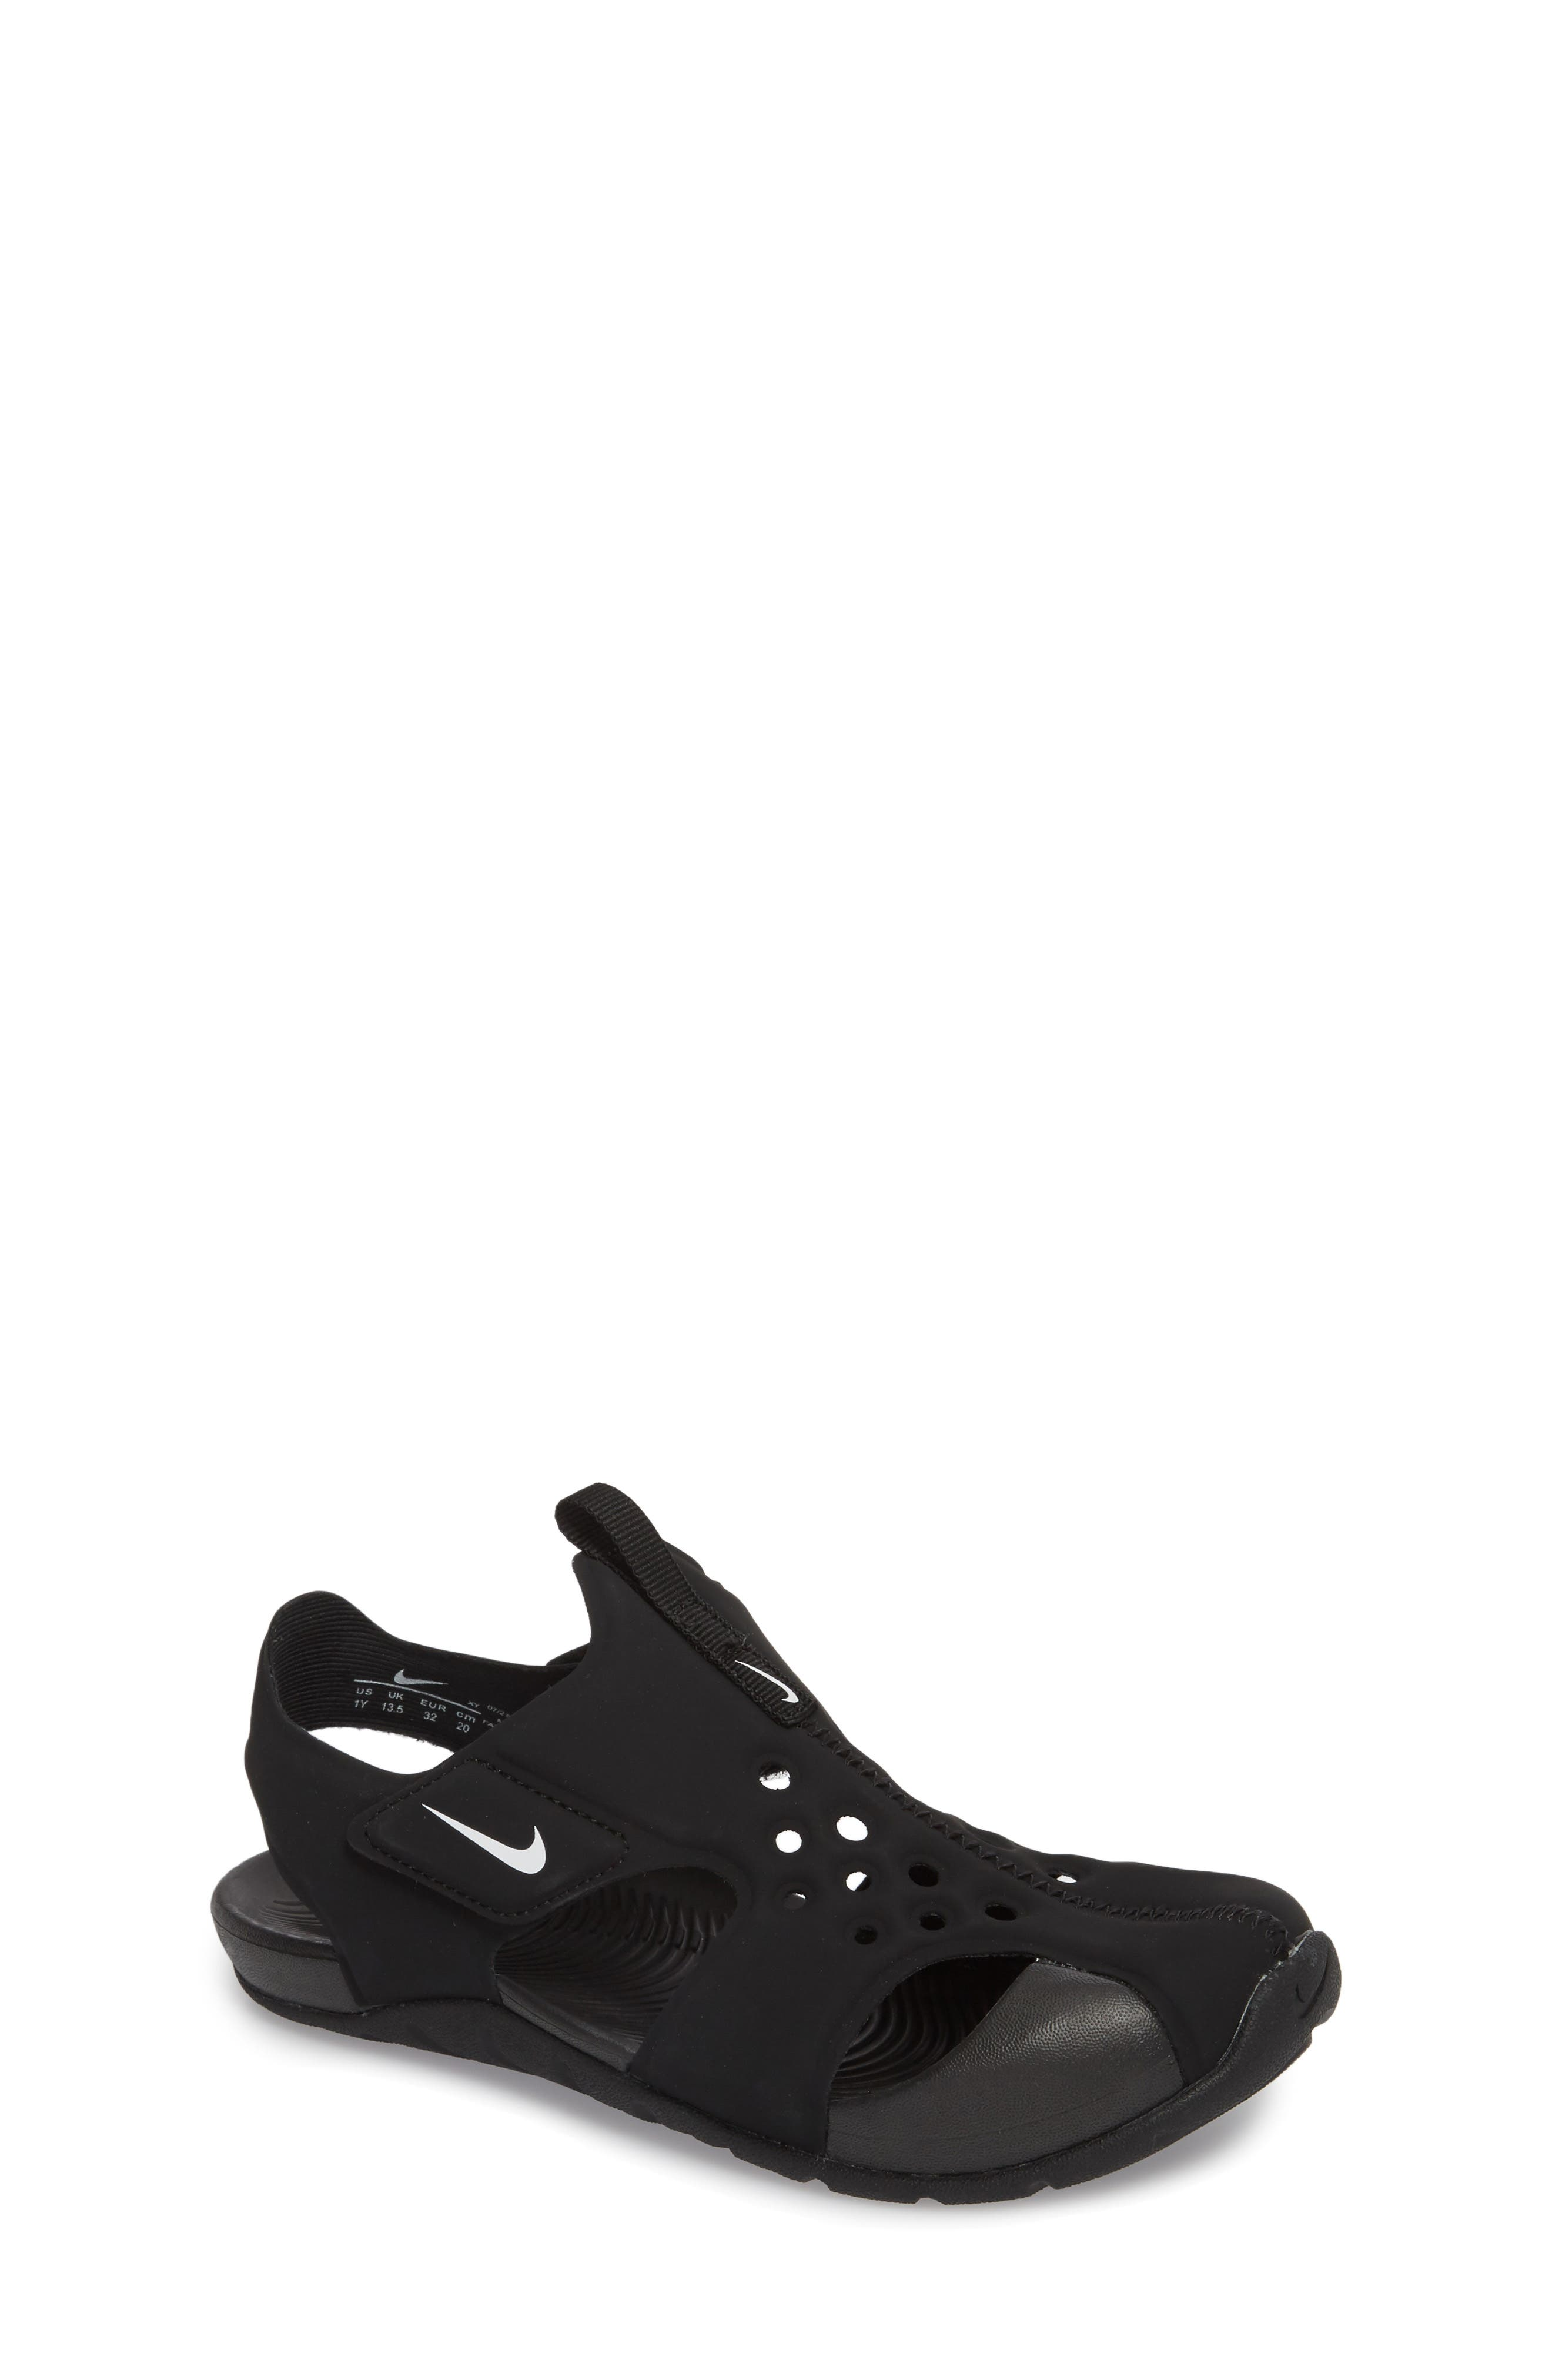 NIKE Sunray Protect 2 Sandal, Main, color, BLACK/ WHITE